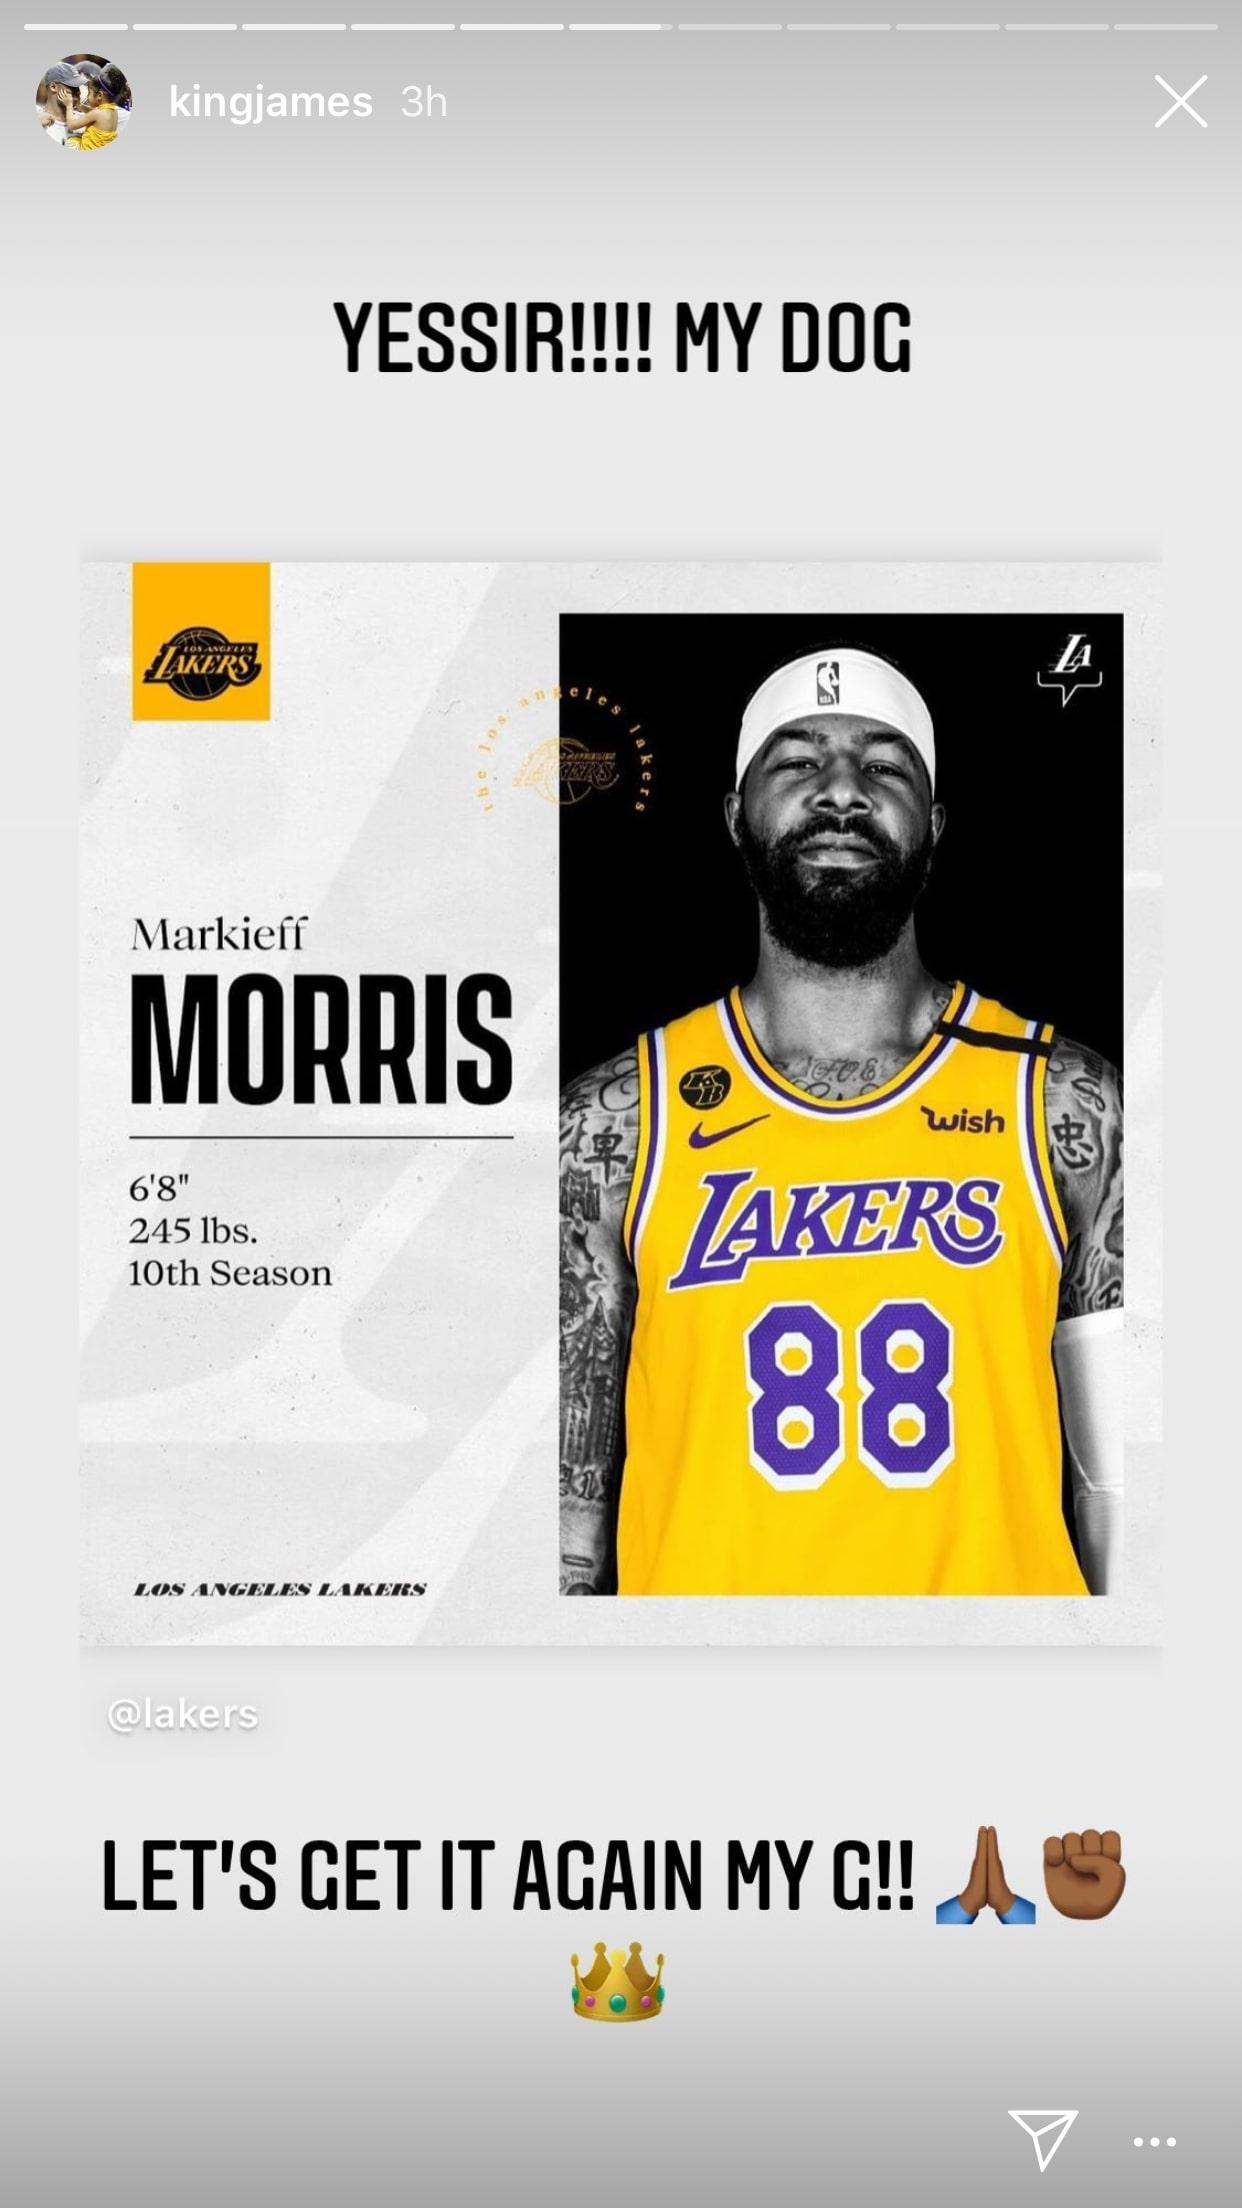 Markieff Morris